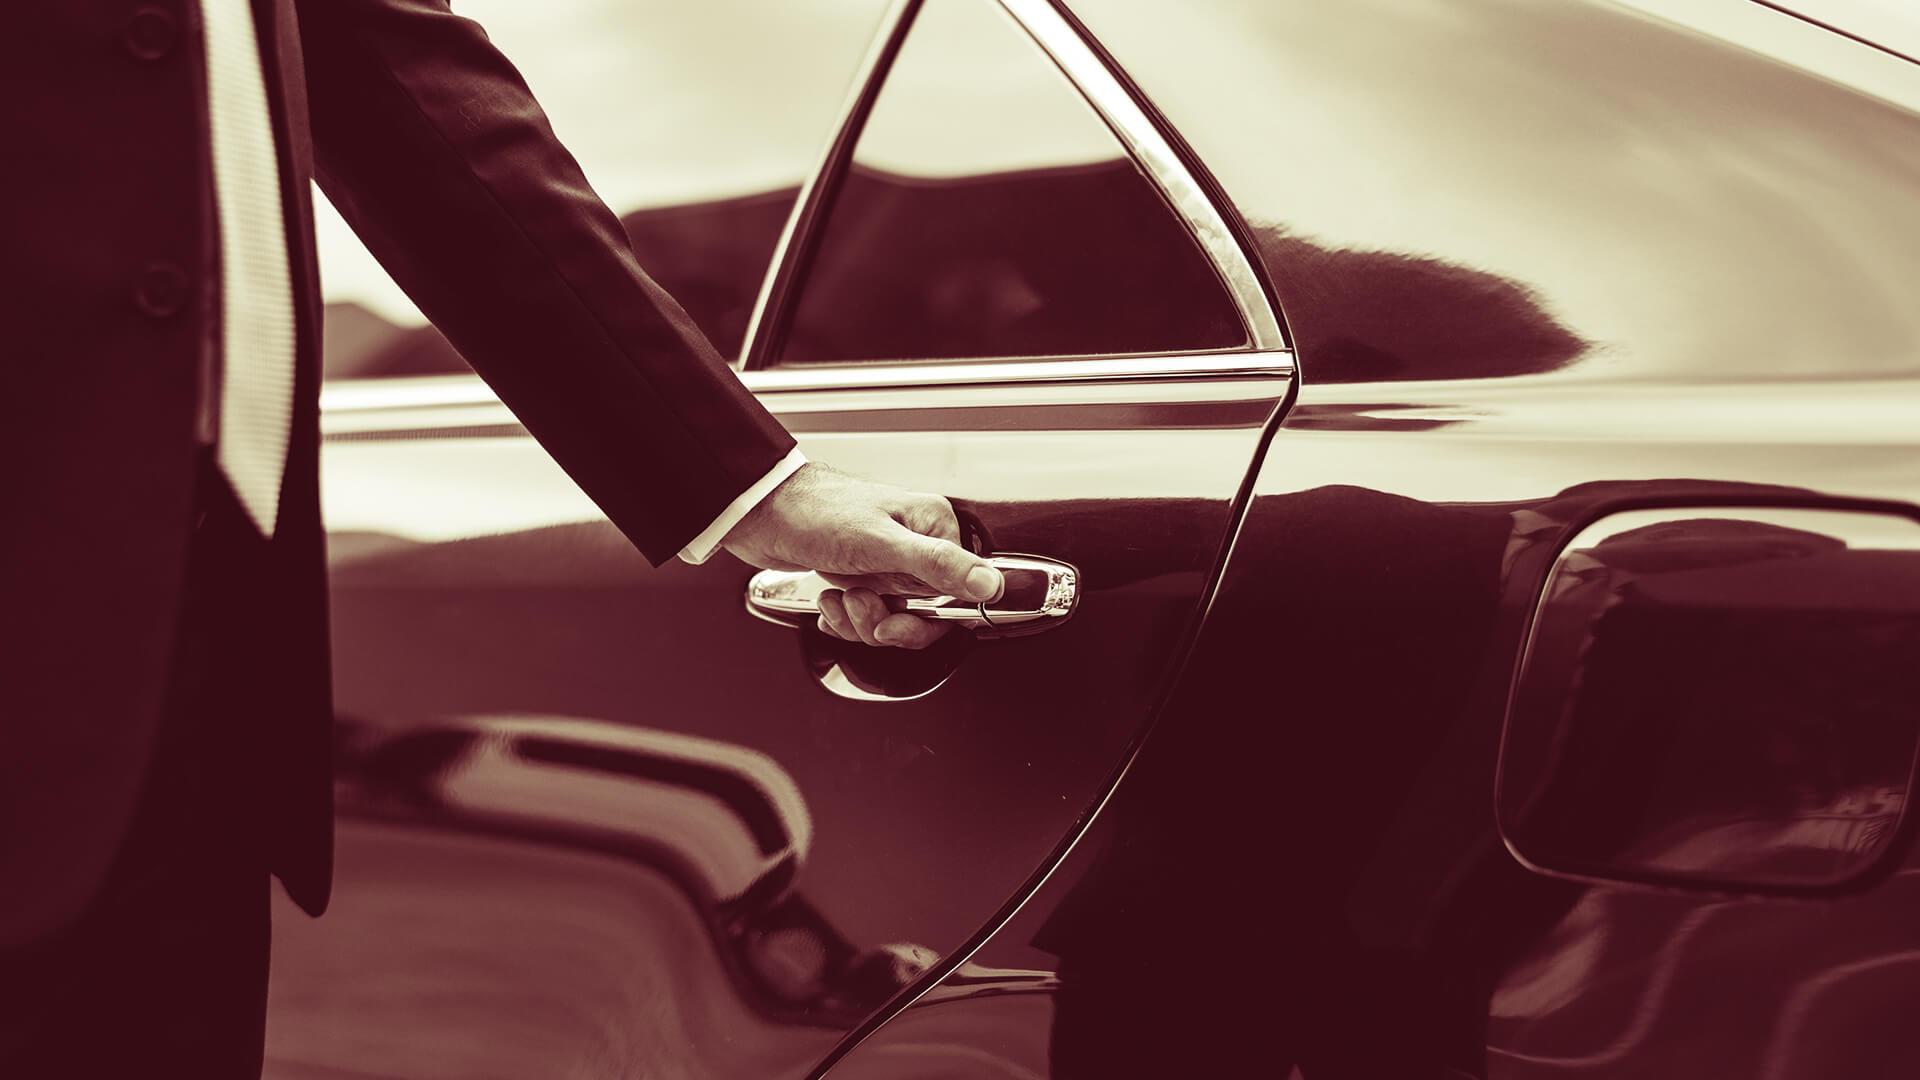 A man opening a luxury car door